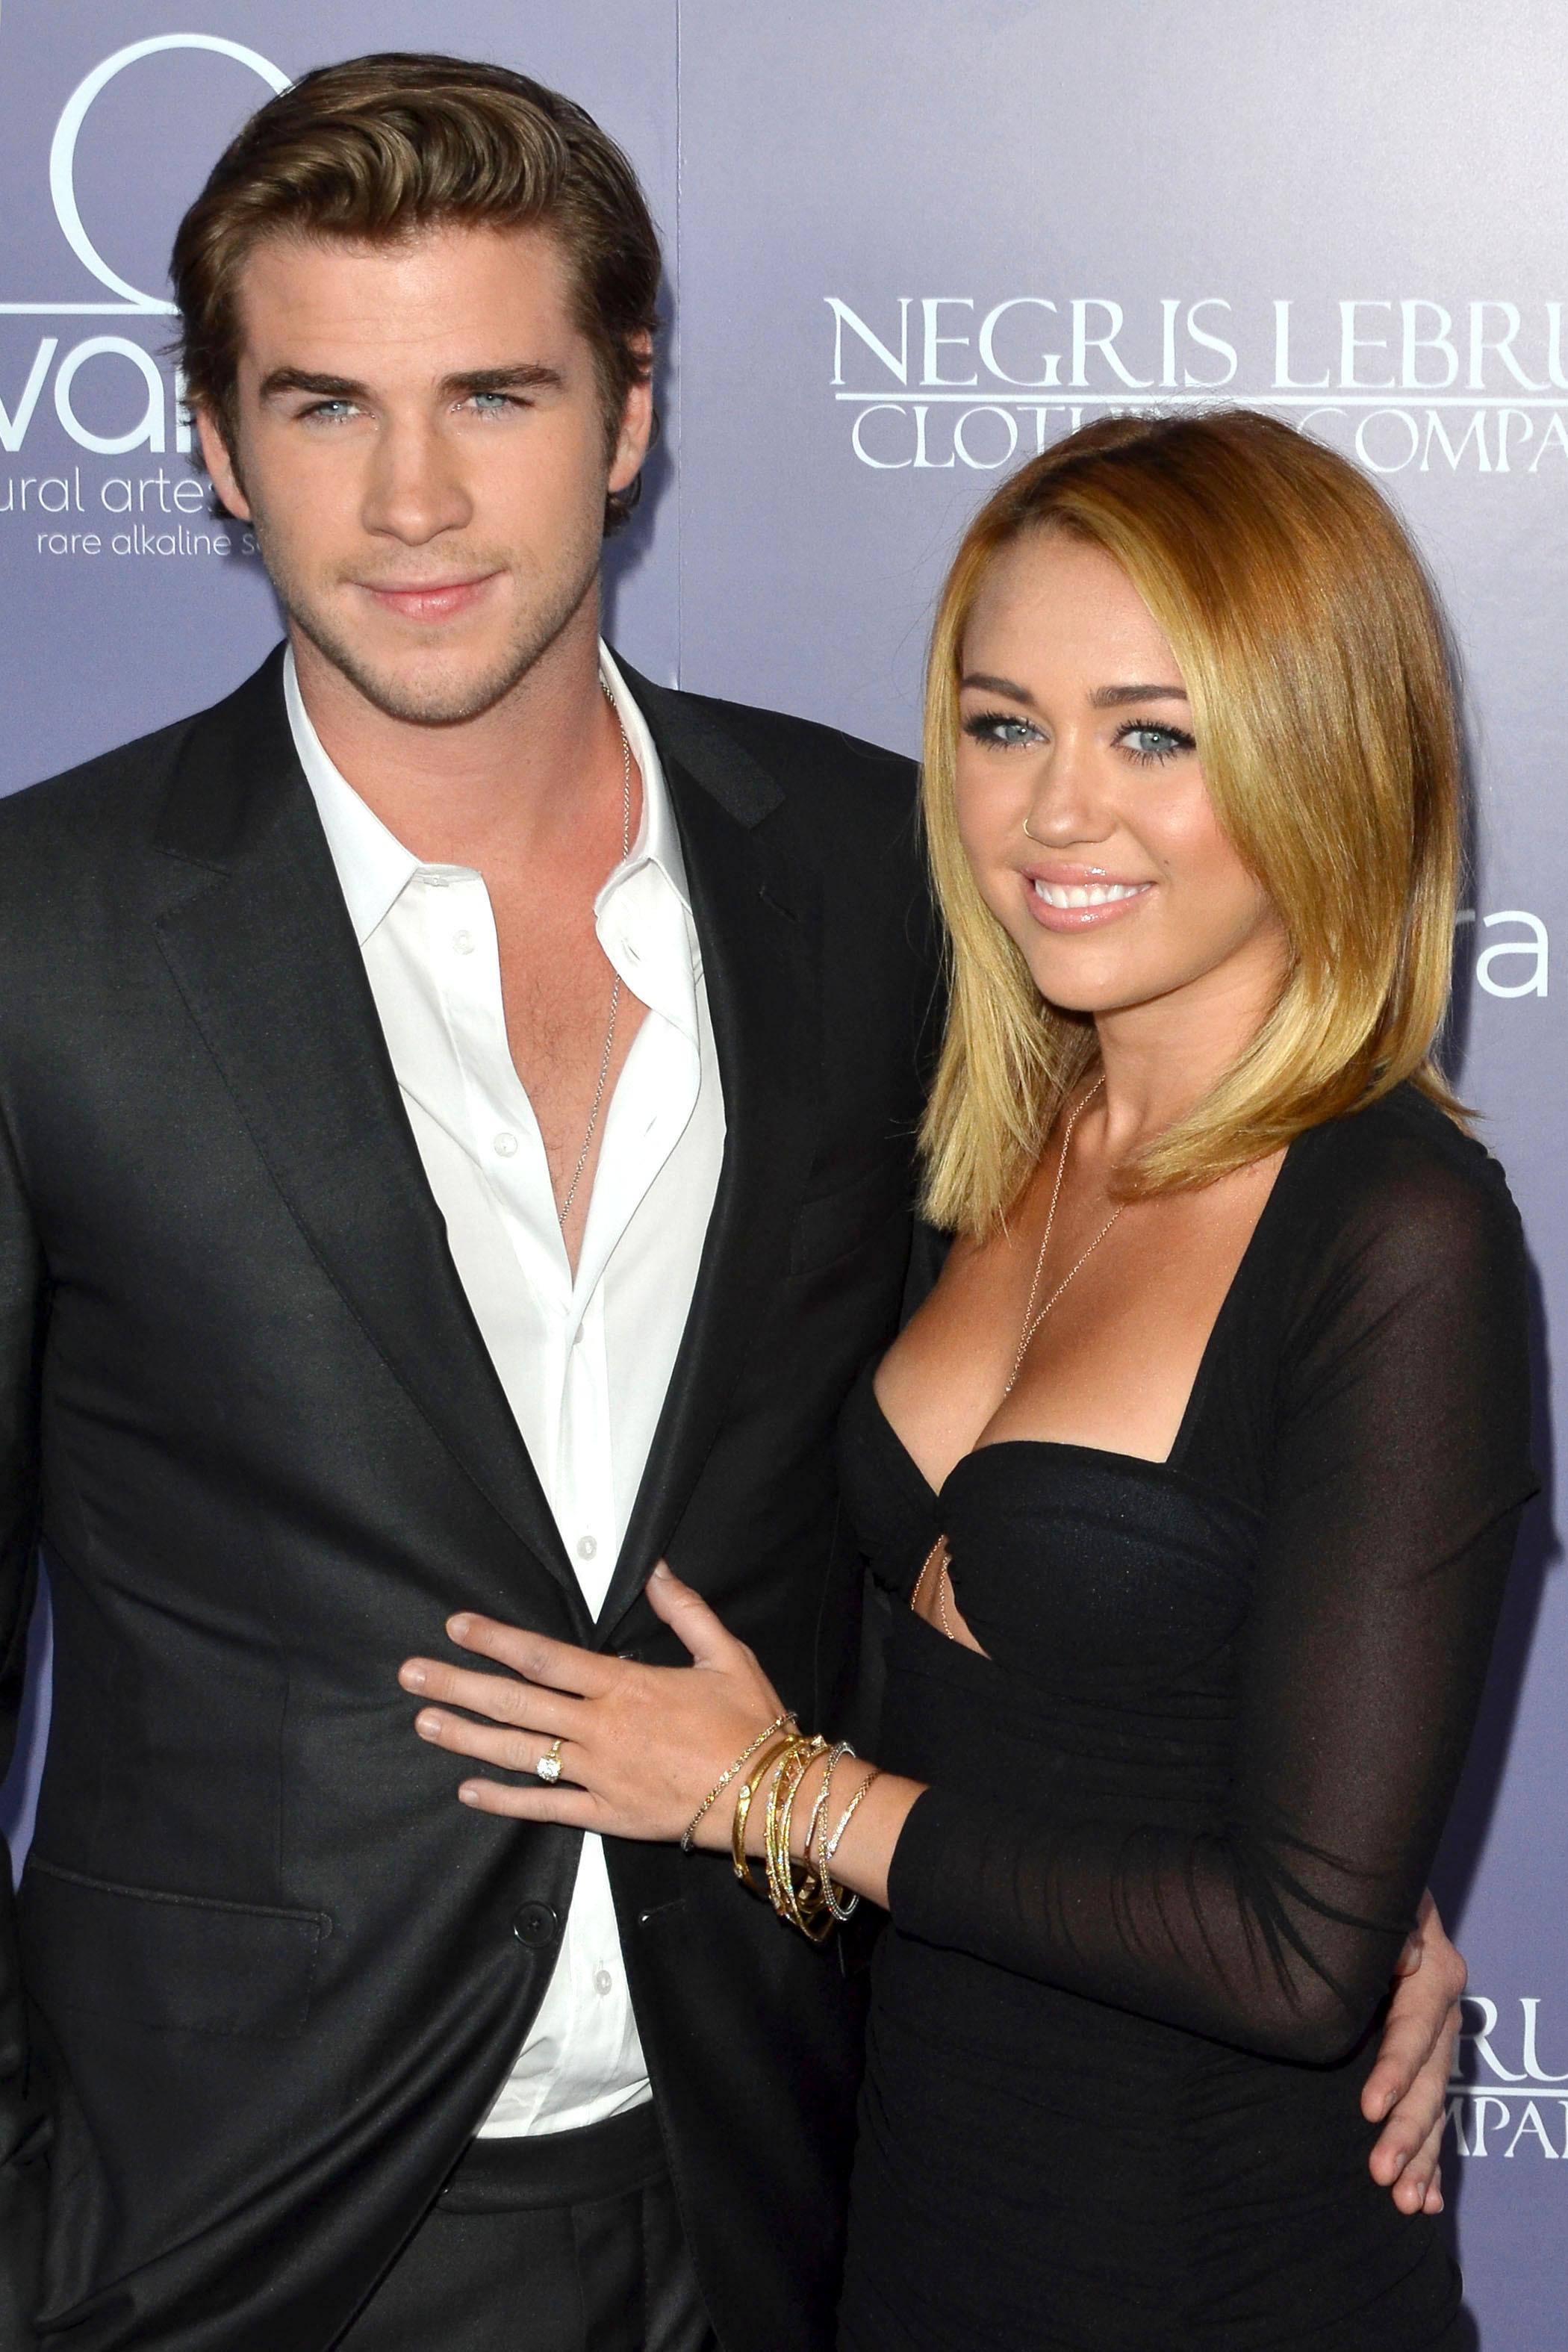 Miley Cyrus on Liam Hemsworth engagement